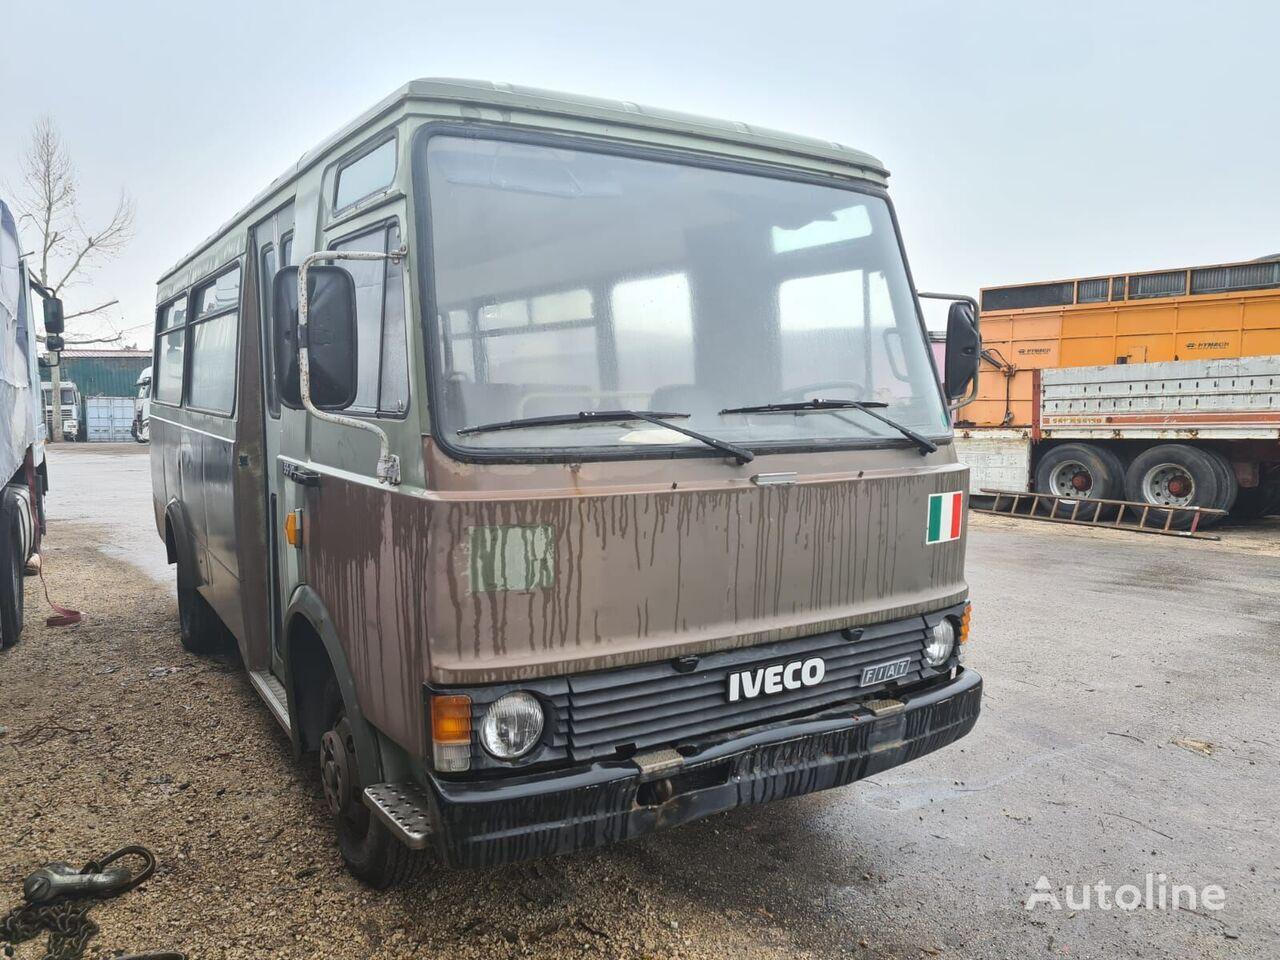 FIAT A 55.10 interurban bus